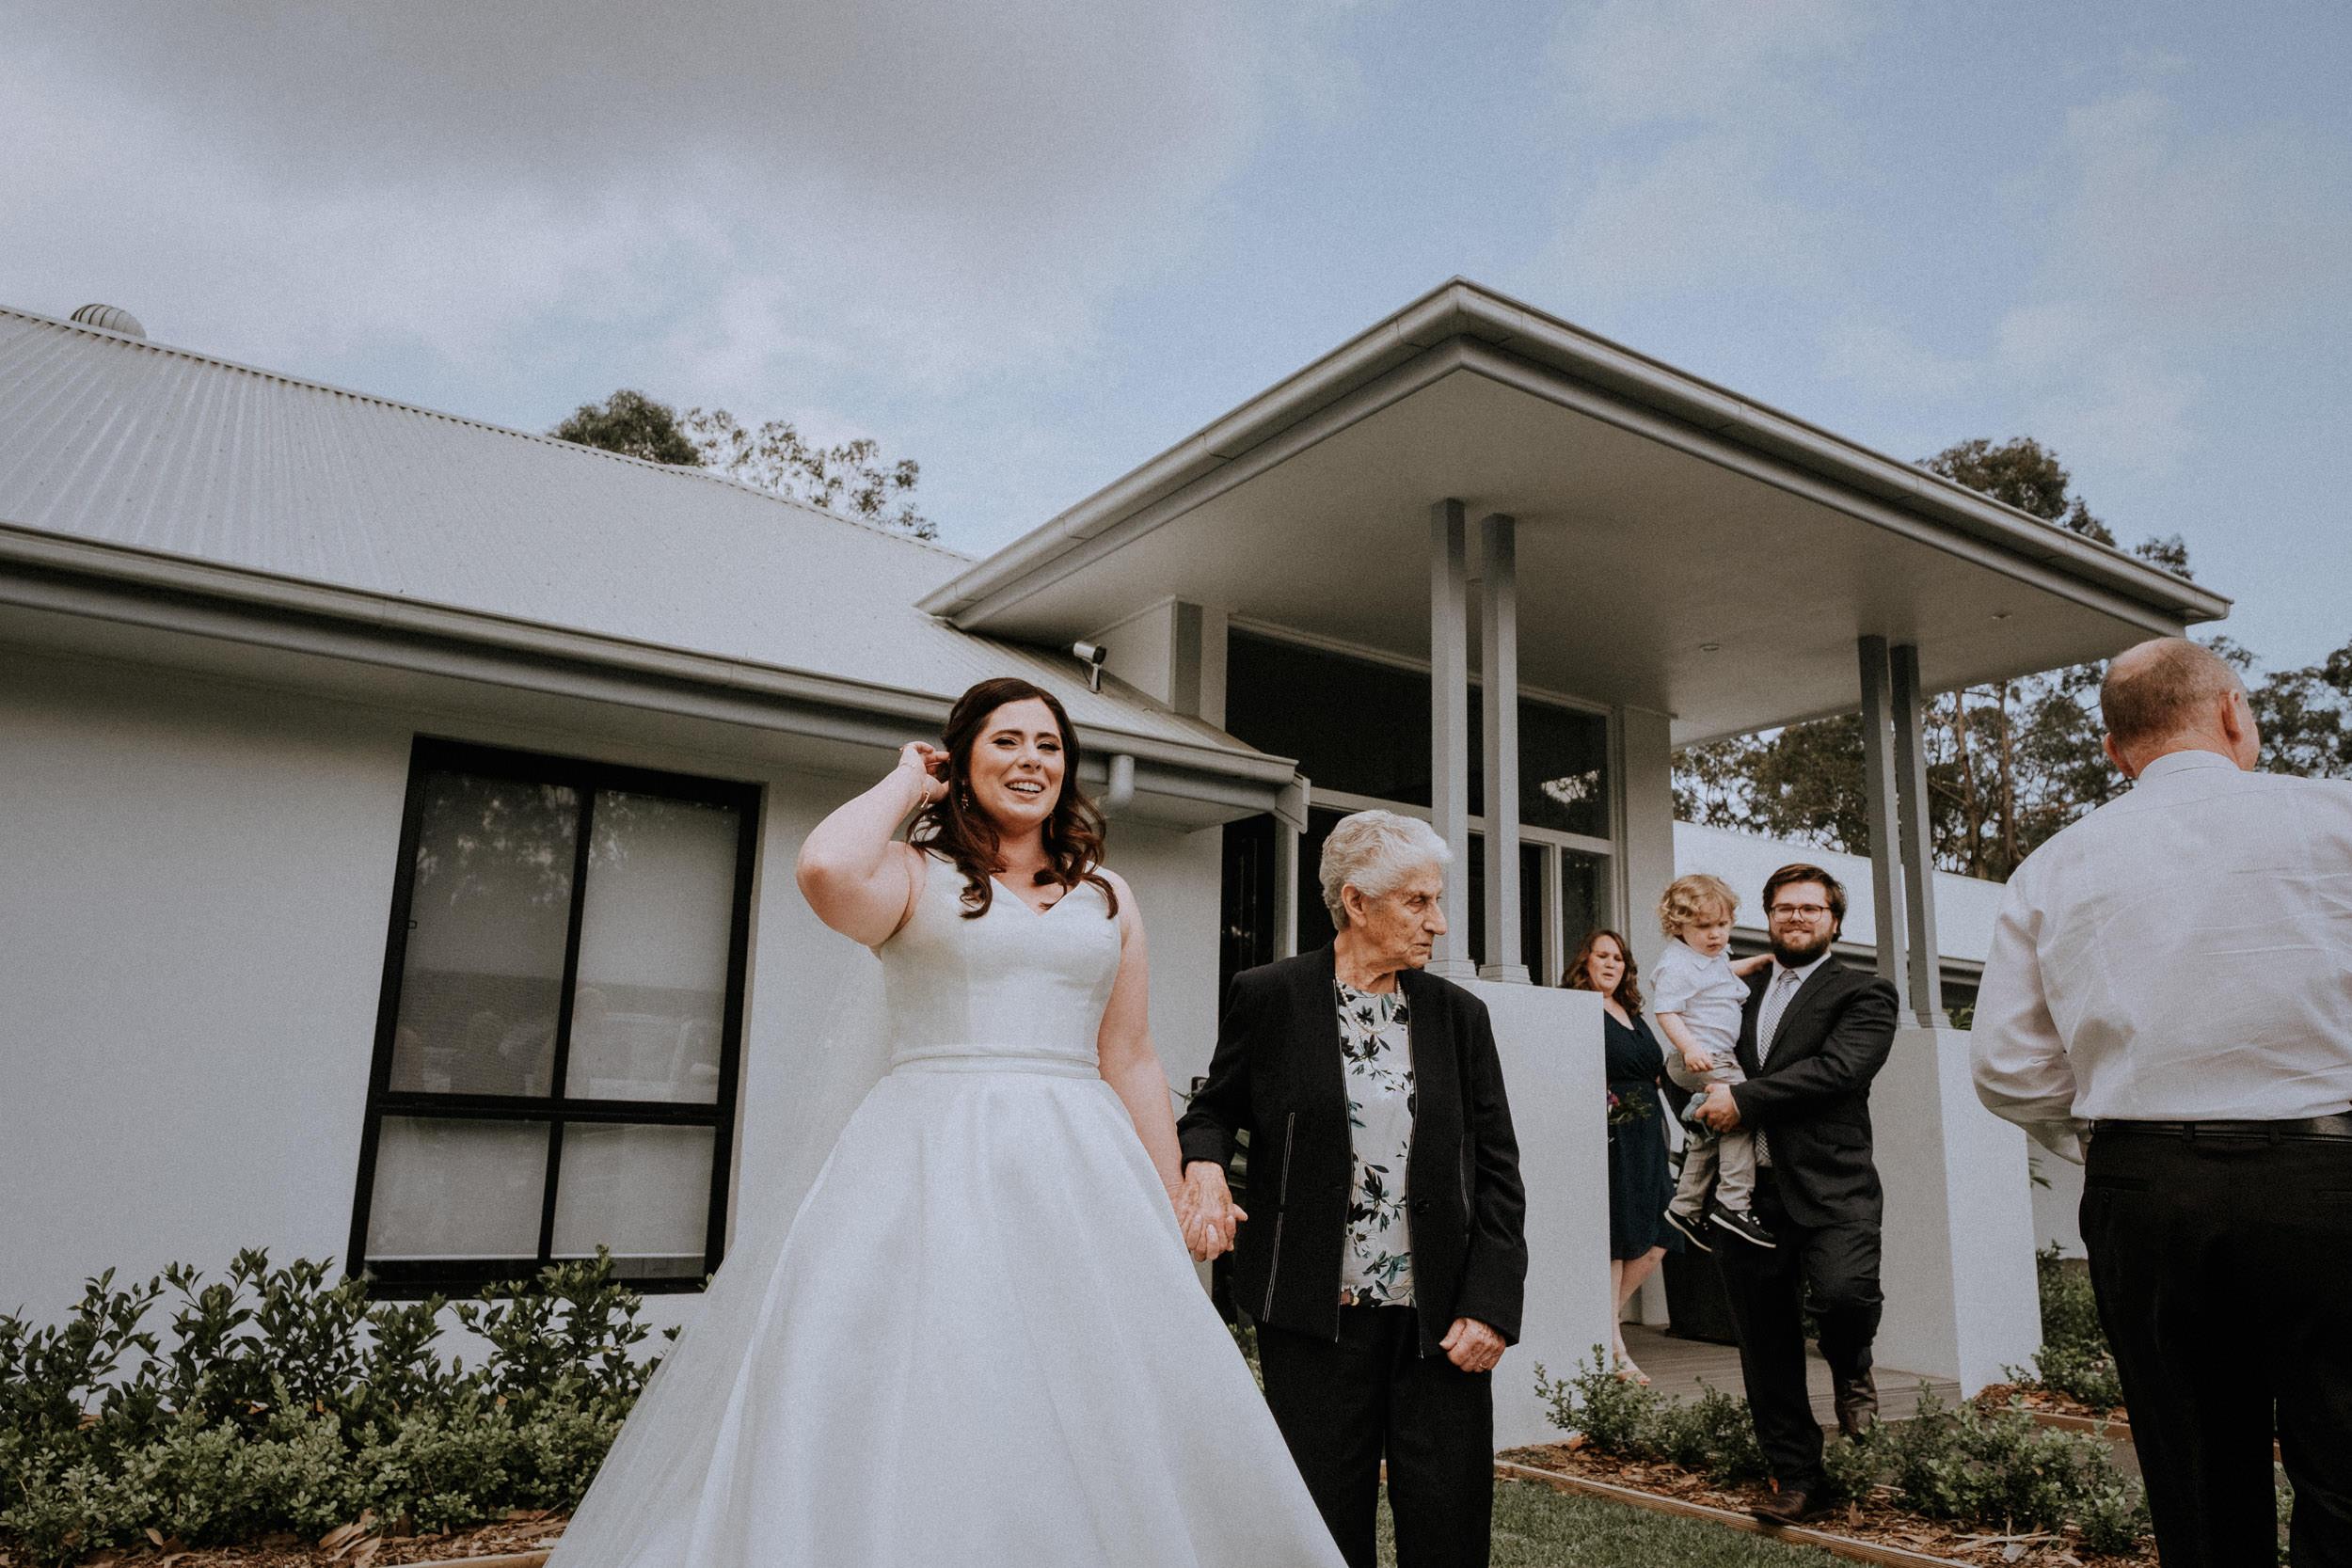 s+j_top_elopement wedding photography_kings & thieves_blog - 140.jpg